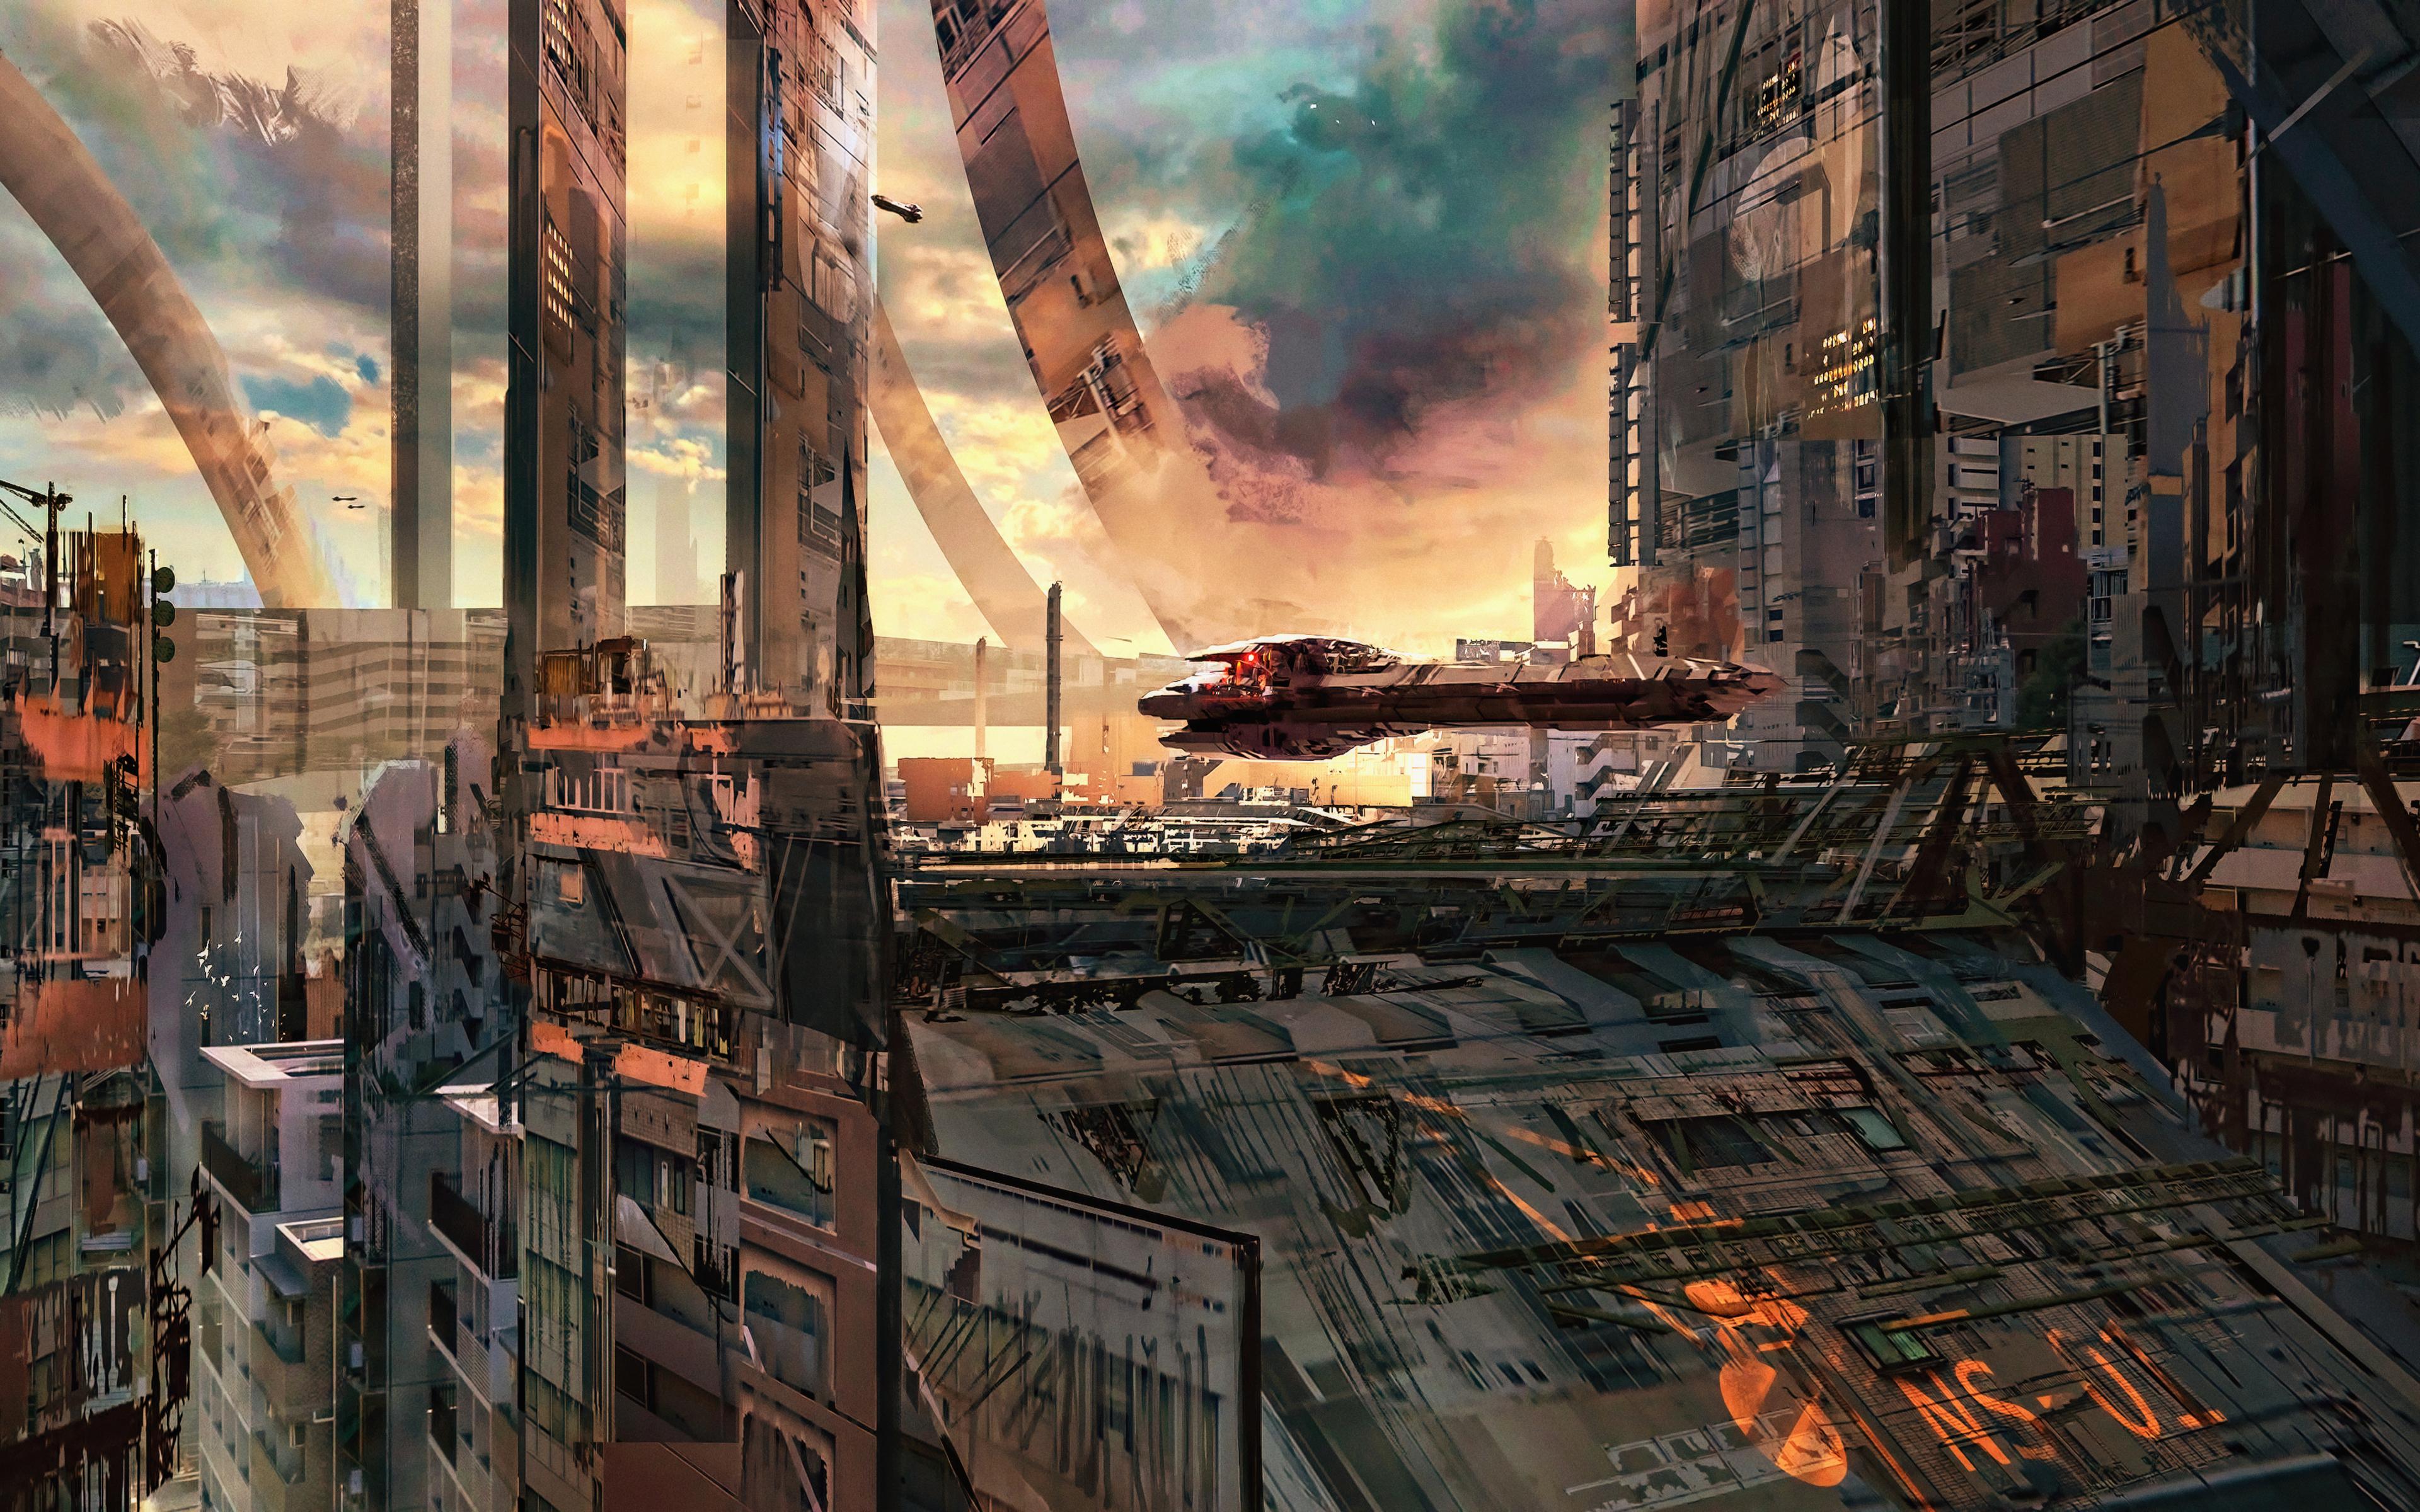 spaceship-3d-science-fiction-4k-bn.jpg